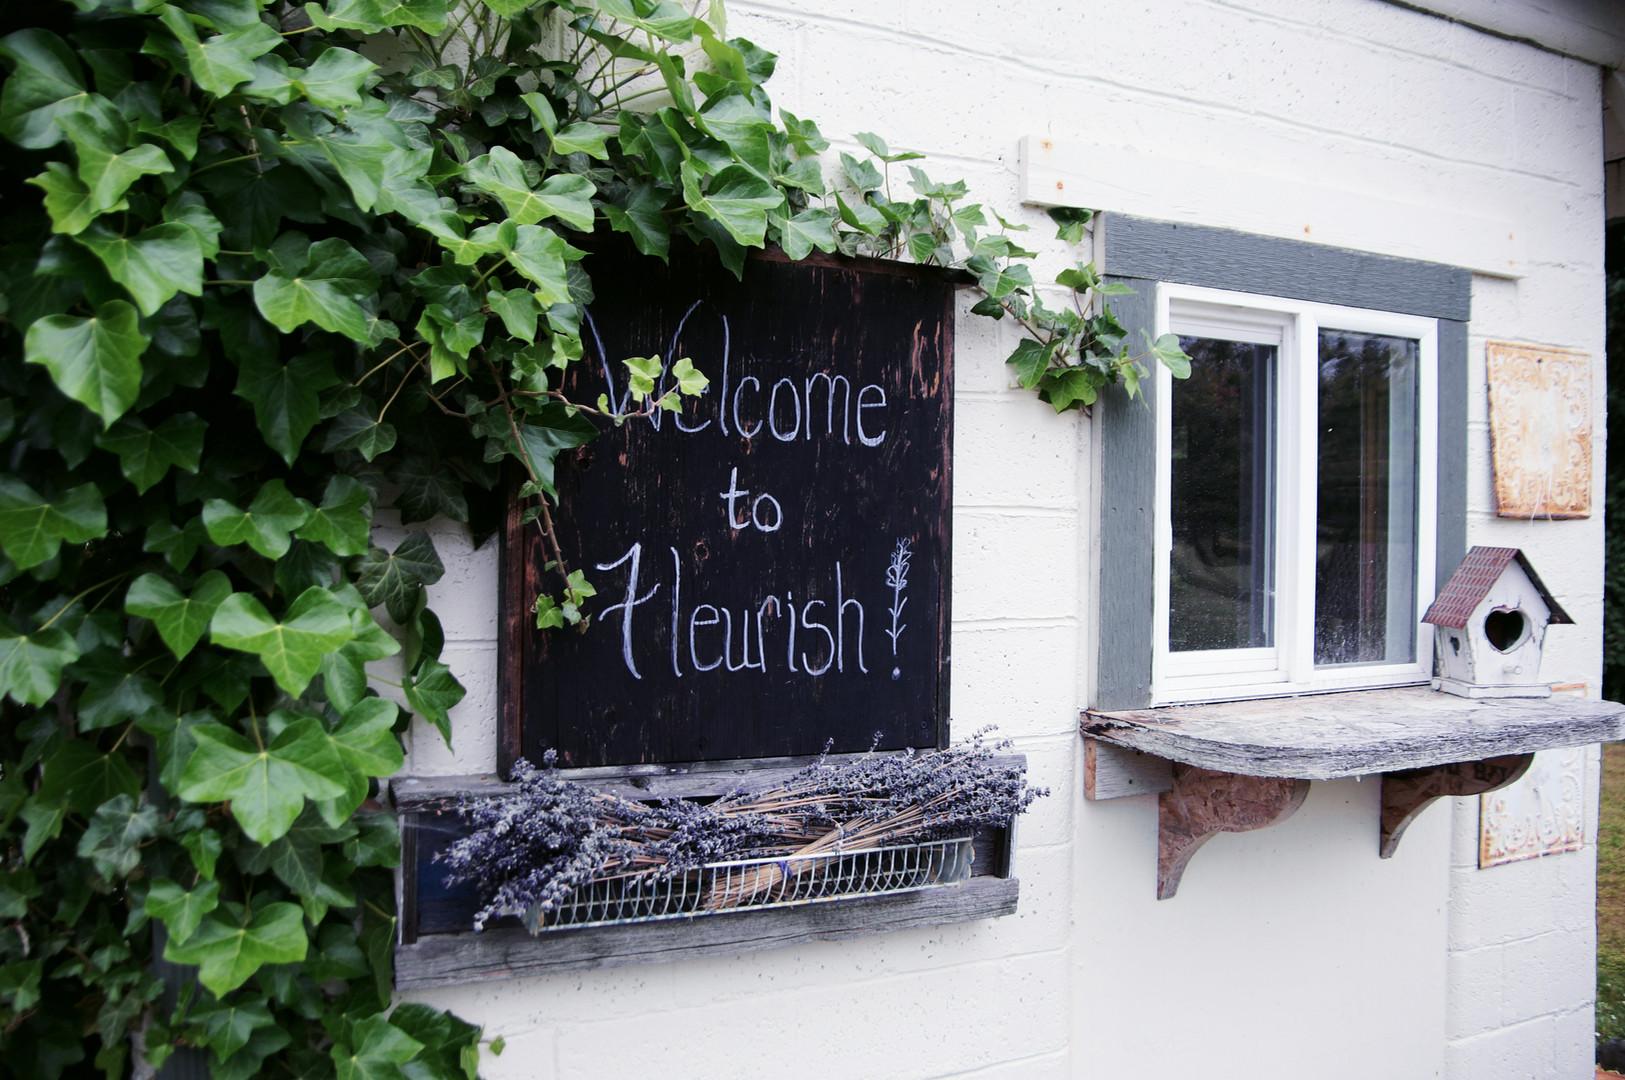 Welcome to Fleurish